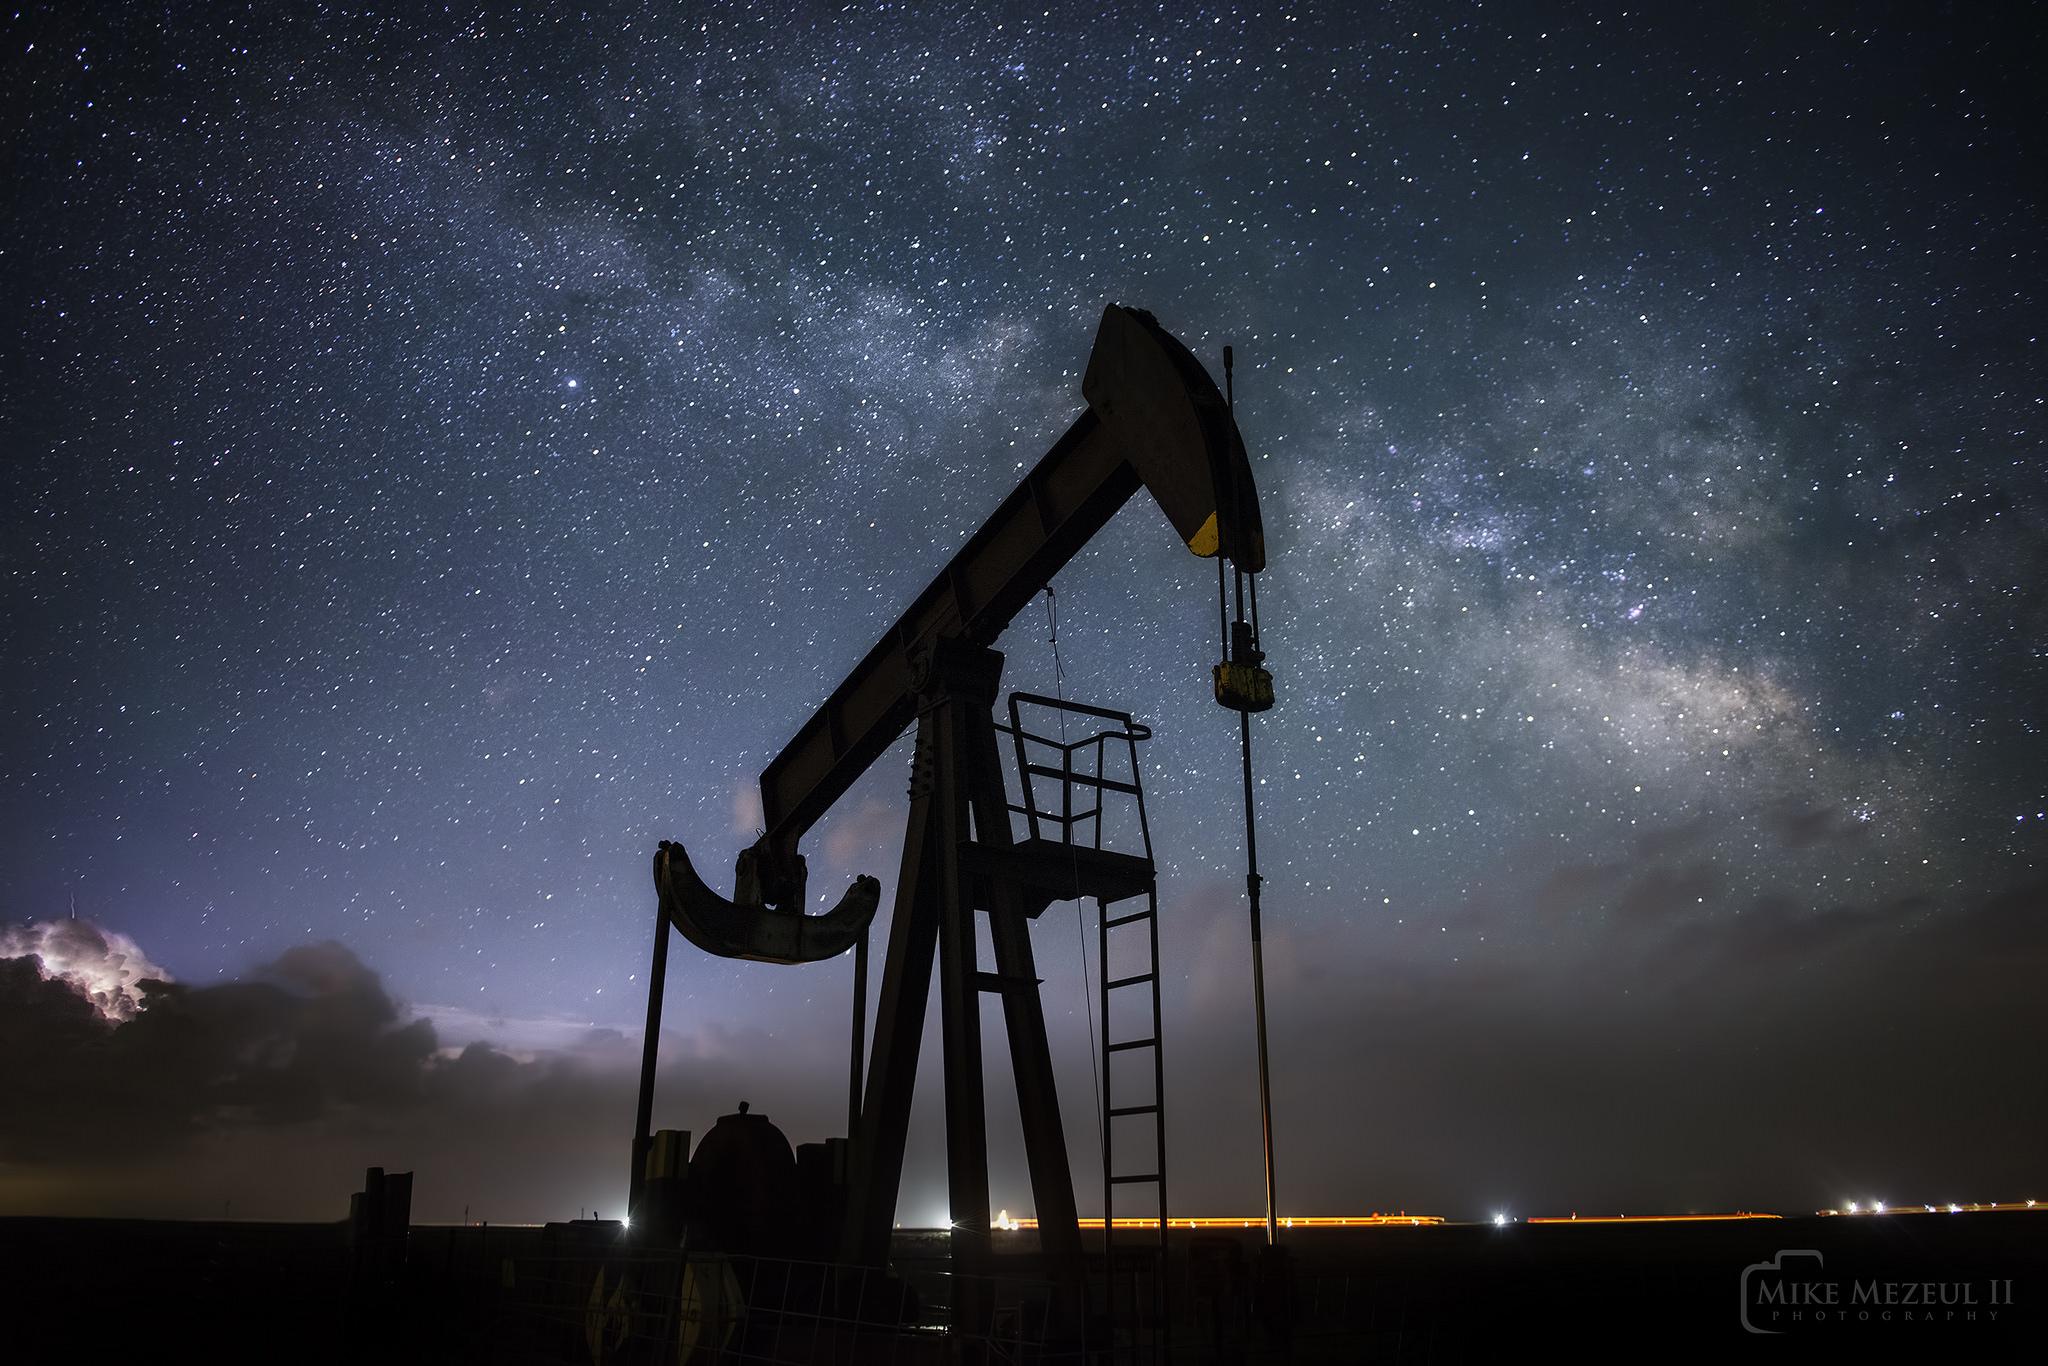 Un caballito petrolero - 2048x1366